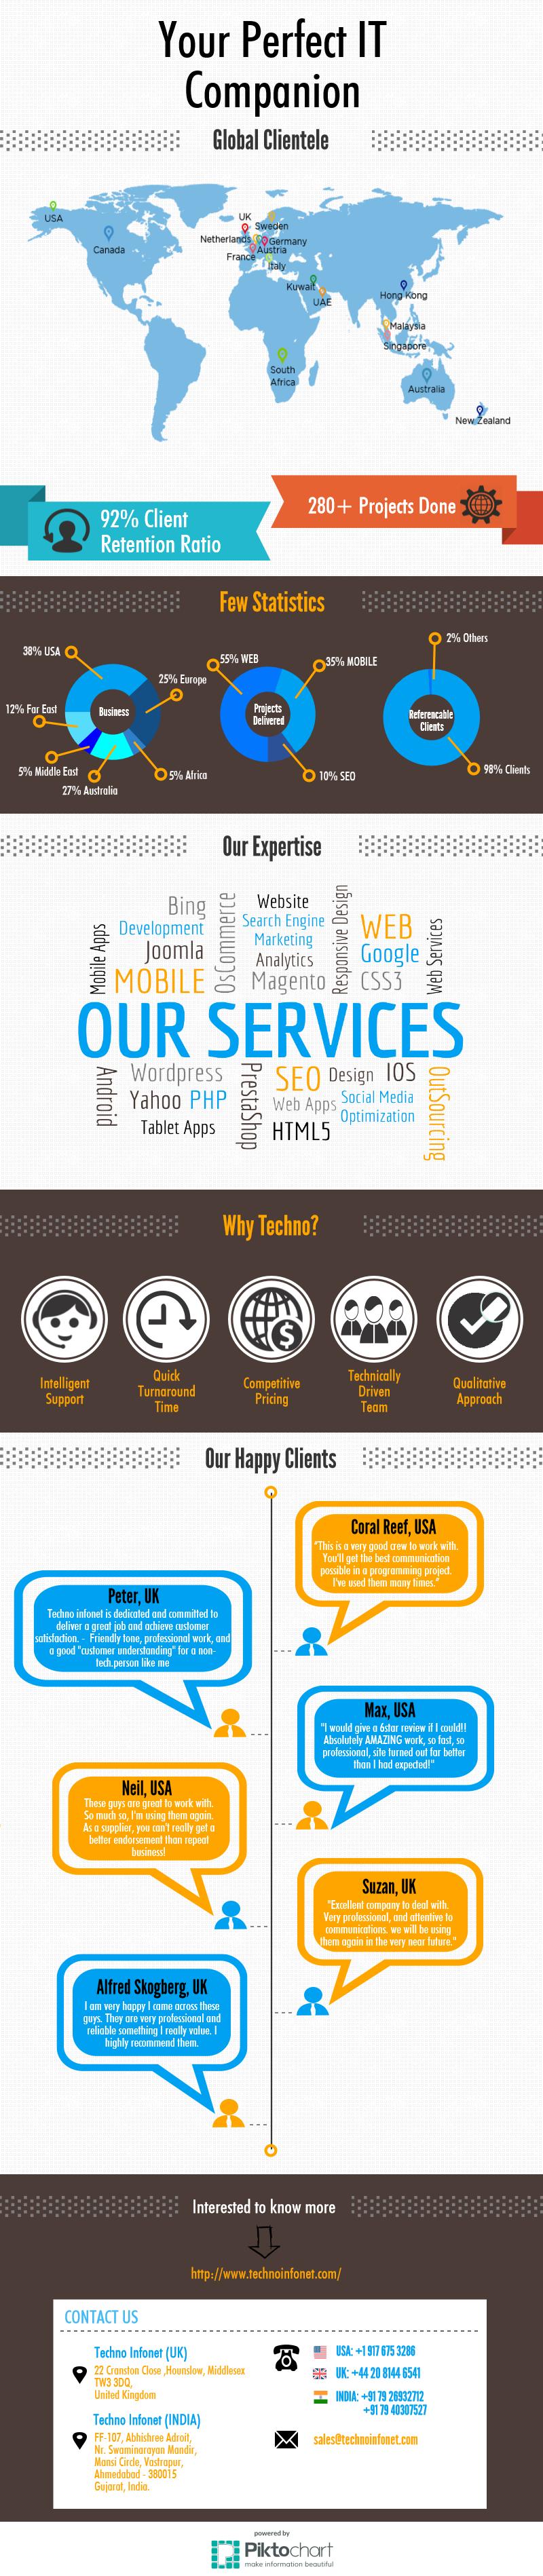 Techno Infonet Company Profile